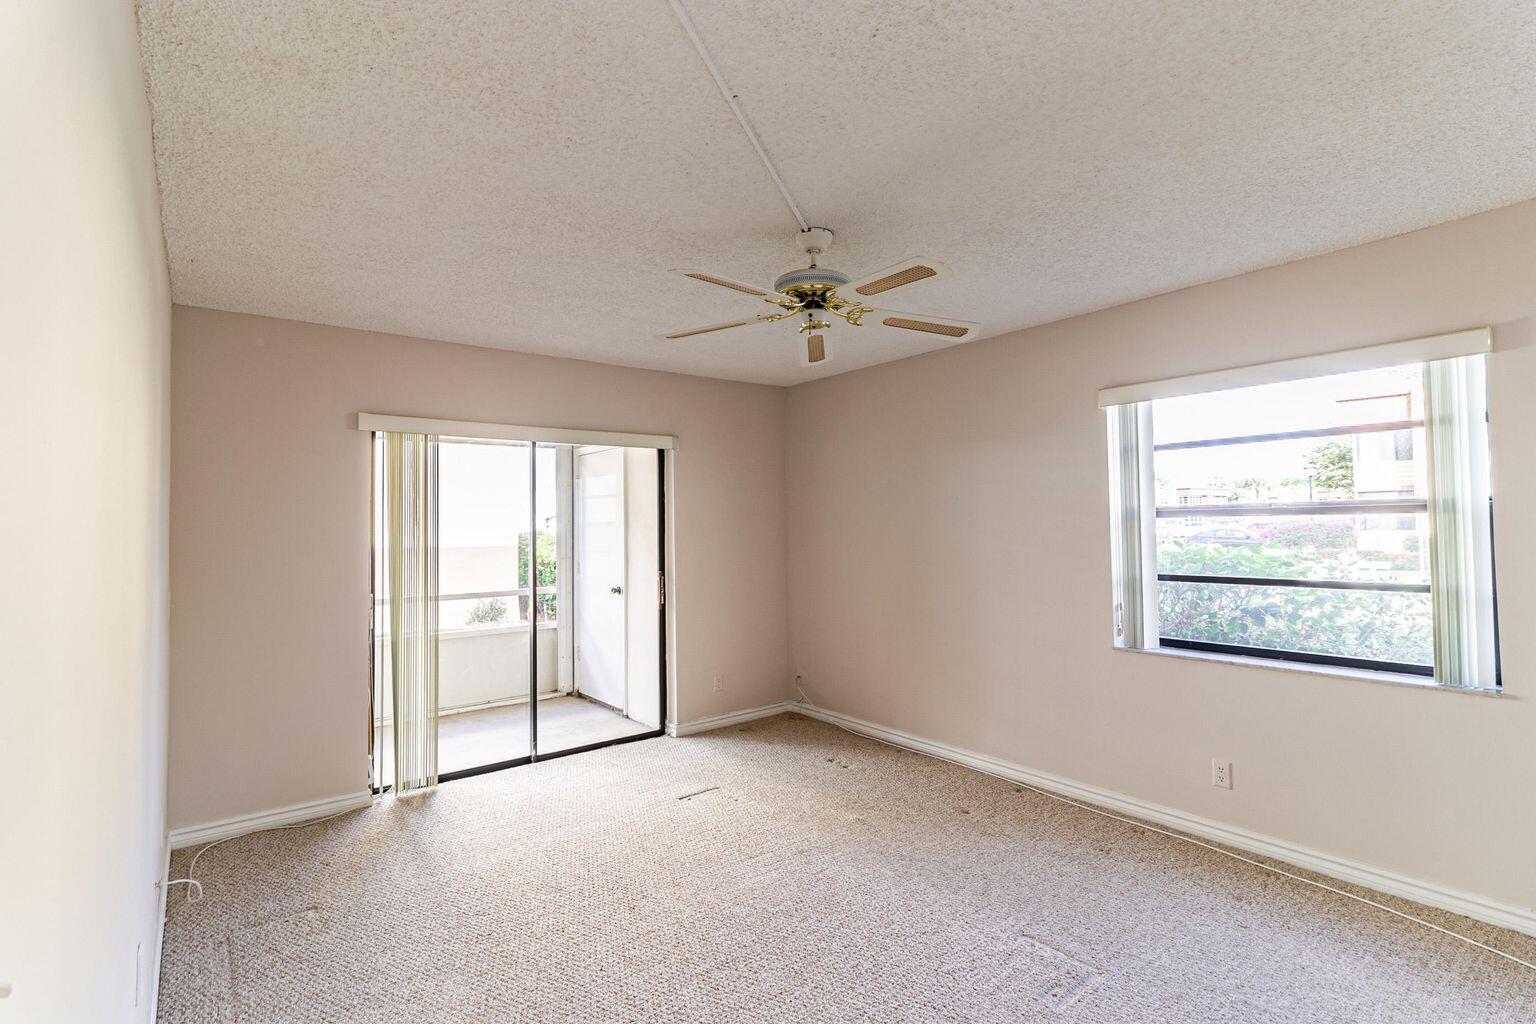 502 Piedmont K, Delray Beach, FL 33484